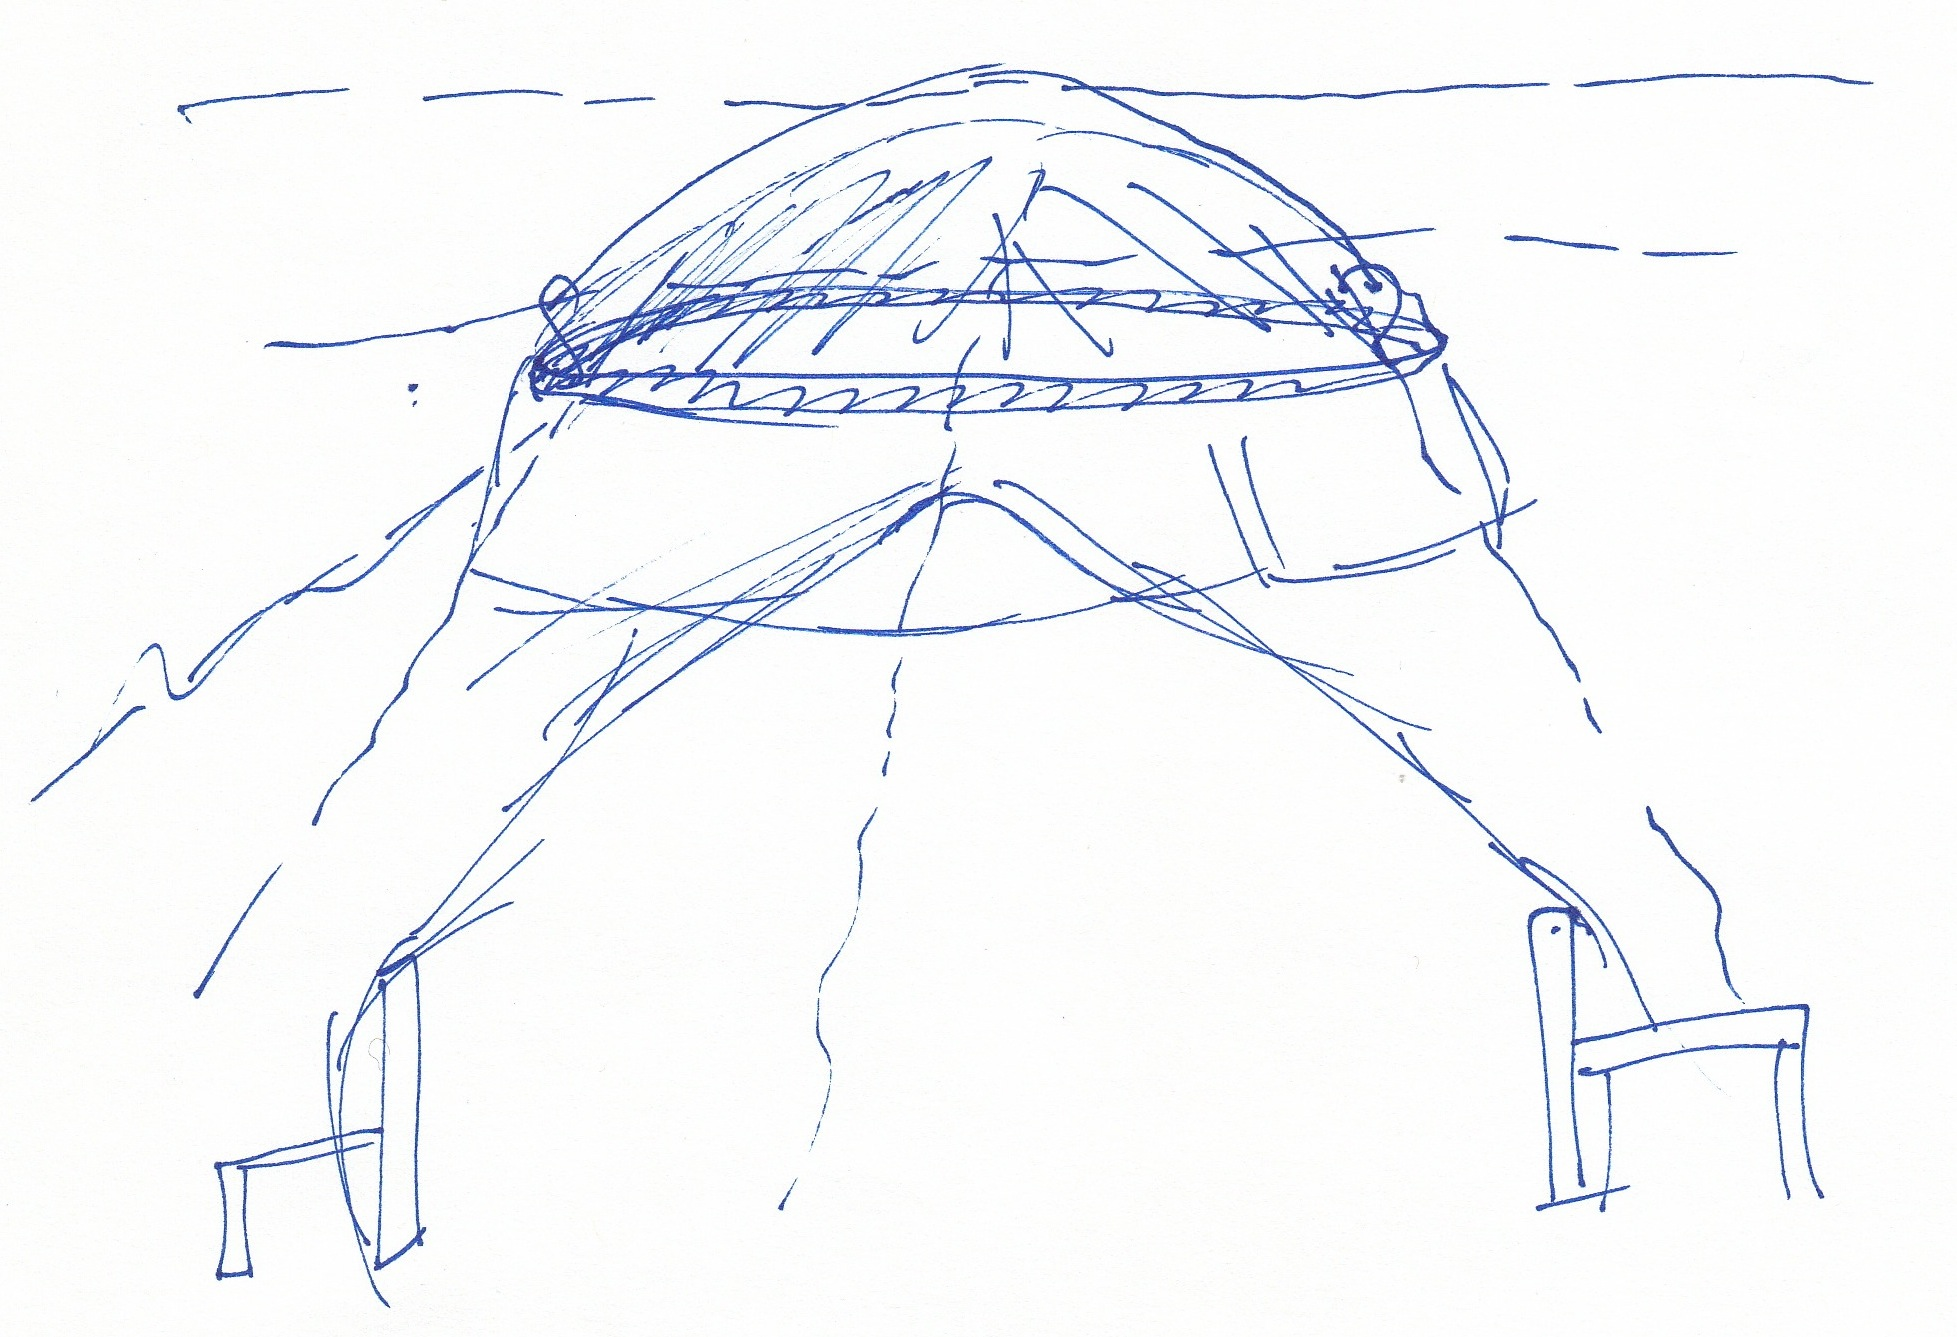 epic-blanket-fort-diagram4.jpg